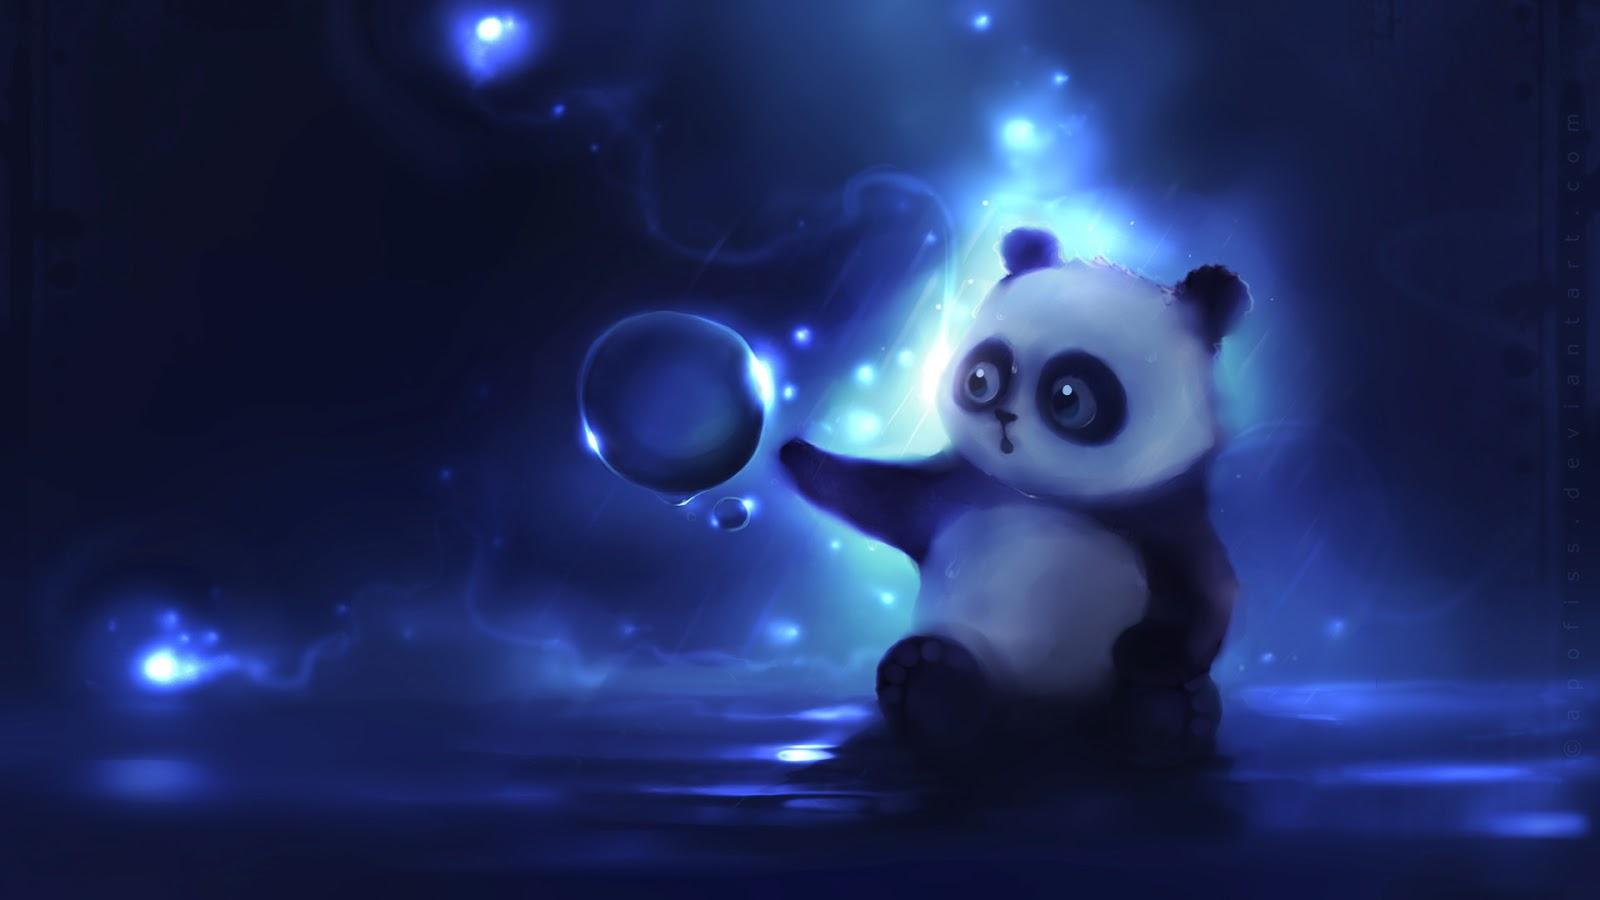 Cute animation wallpaper with panda bear ball curiosity   Will 1600x900